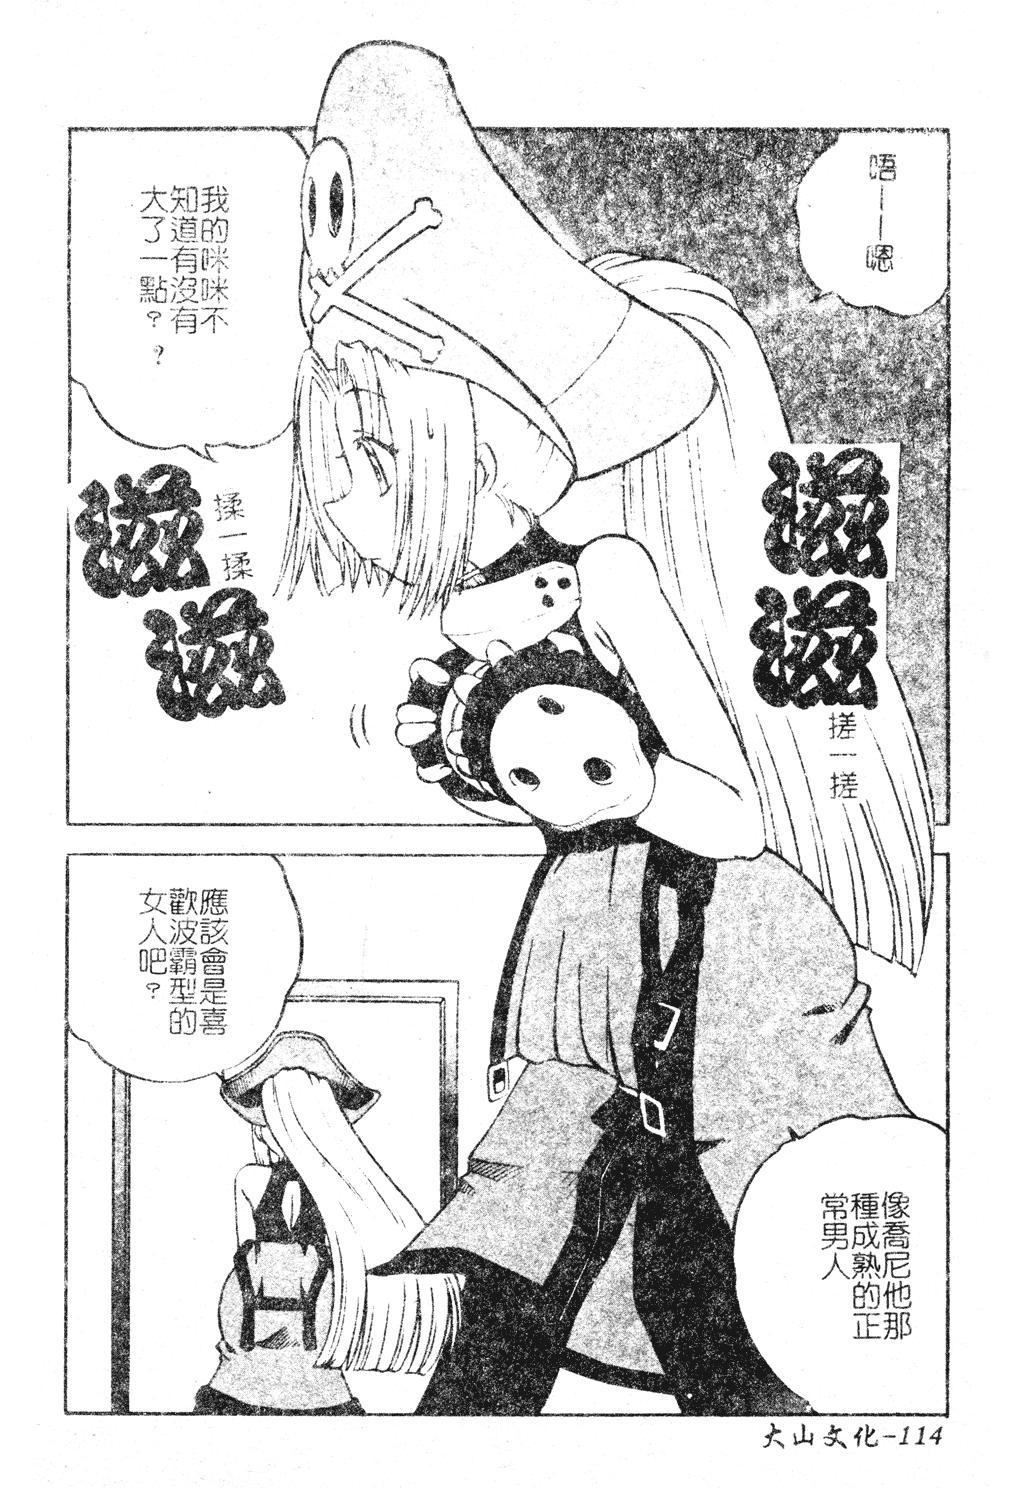 DenNow Koihime Collection 7 112